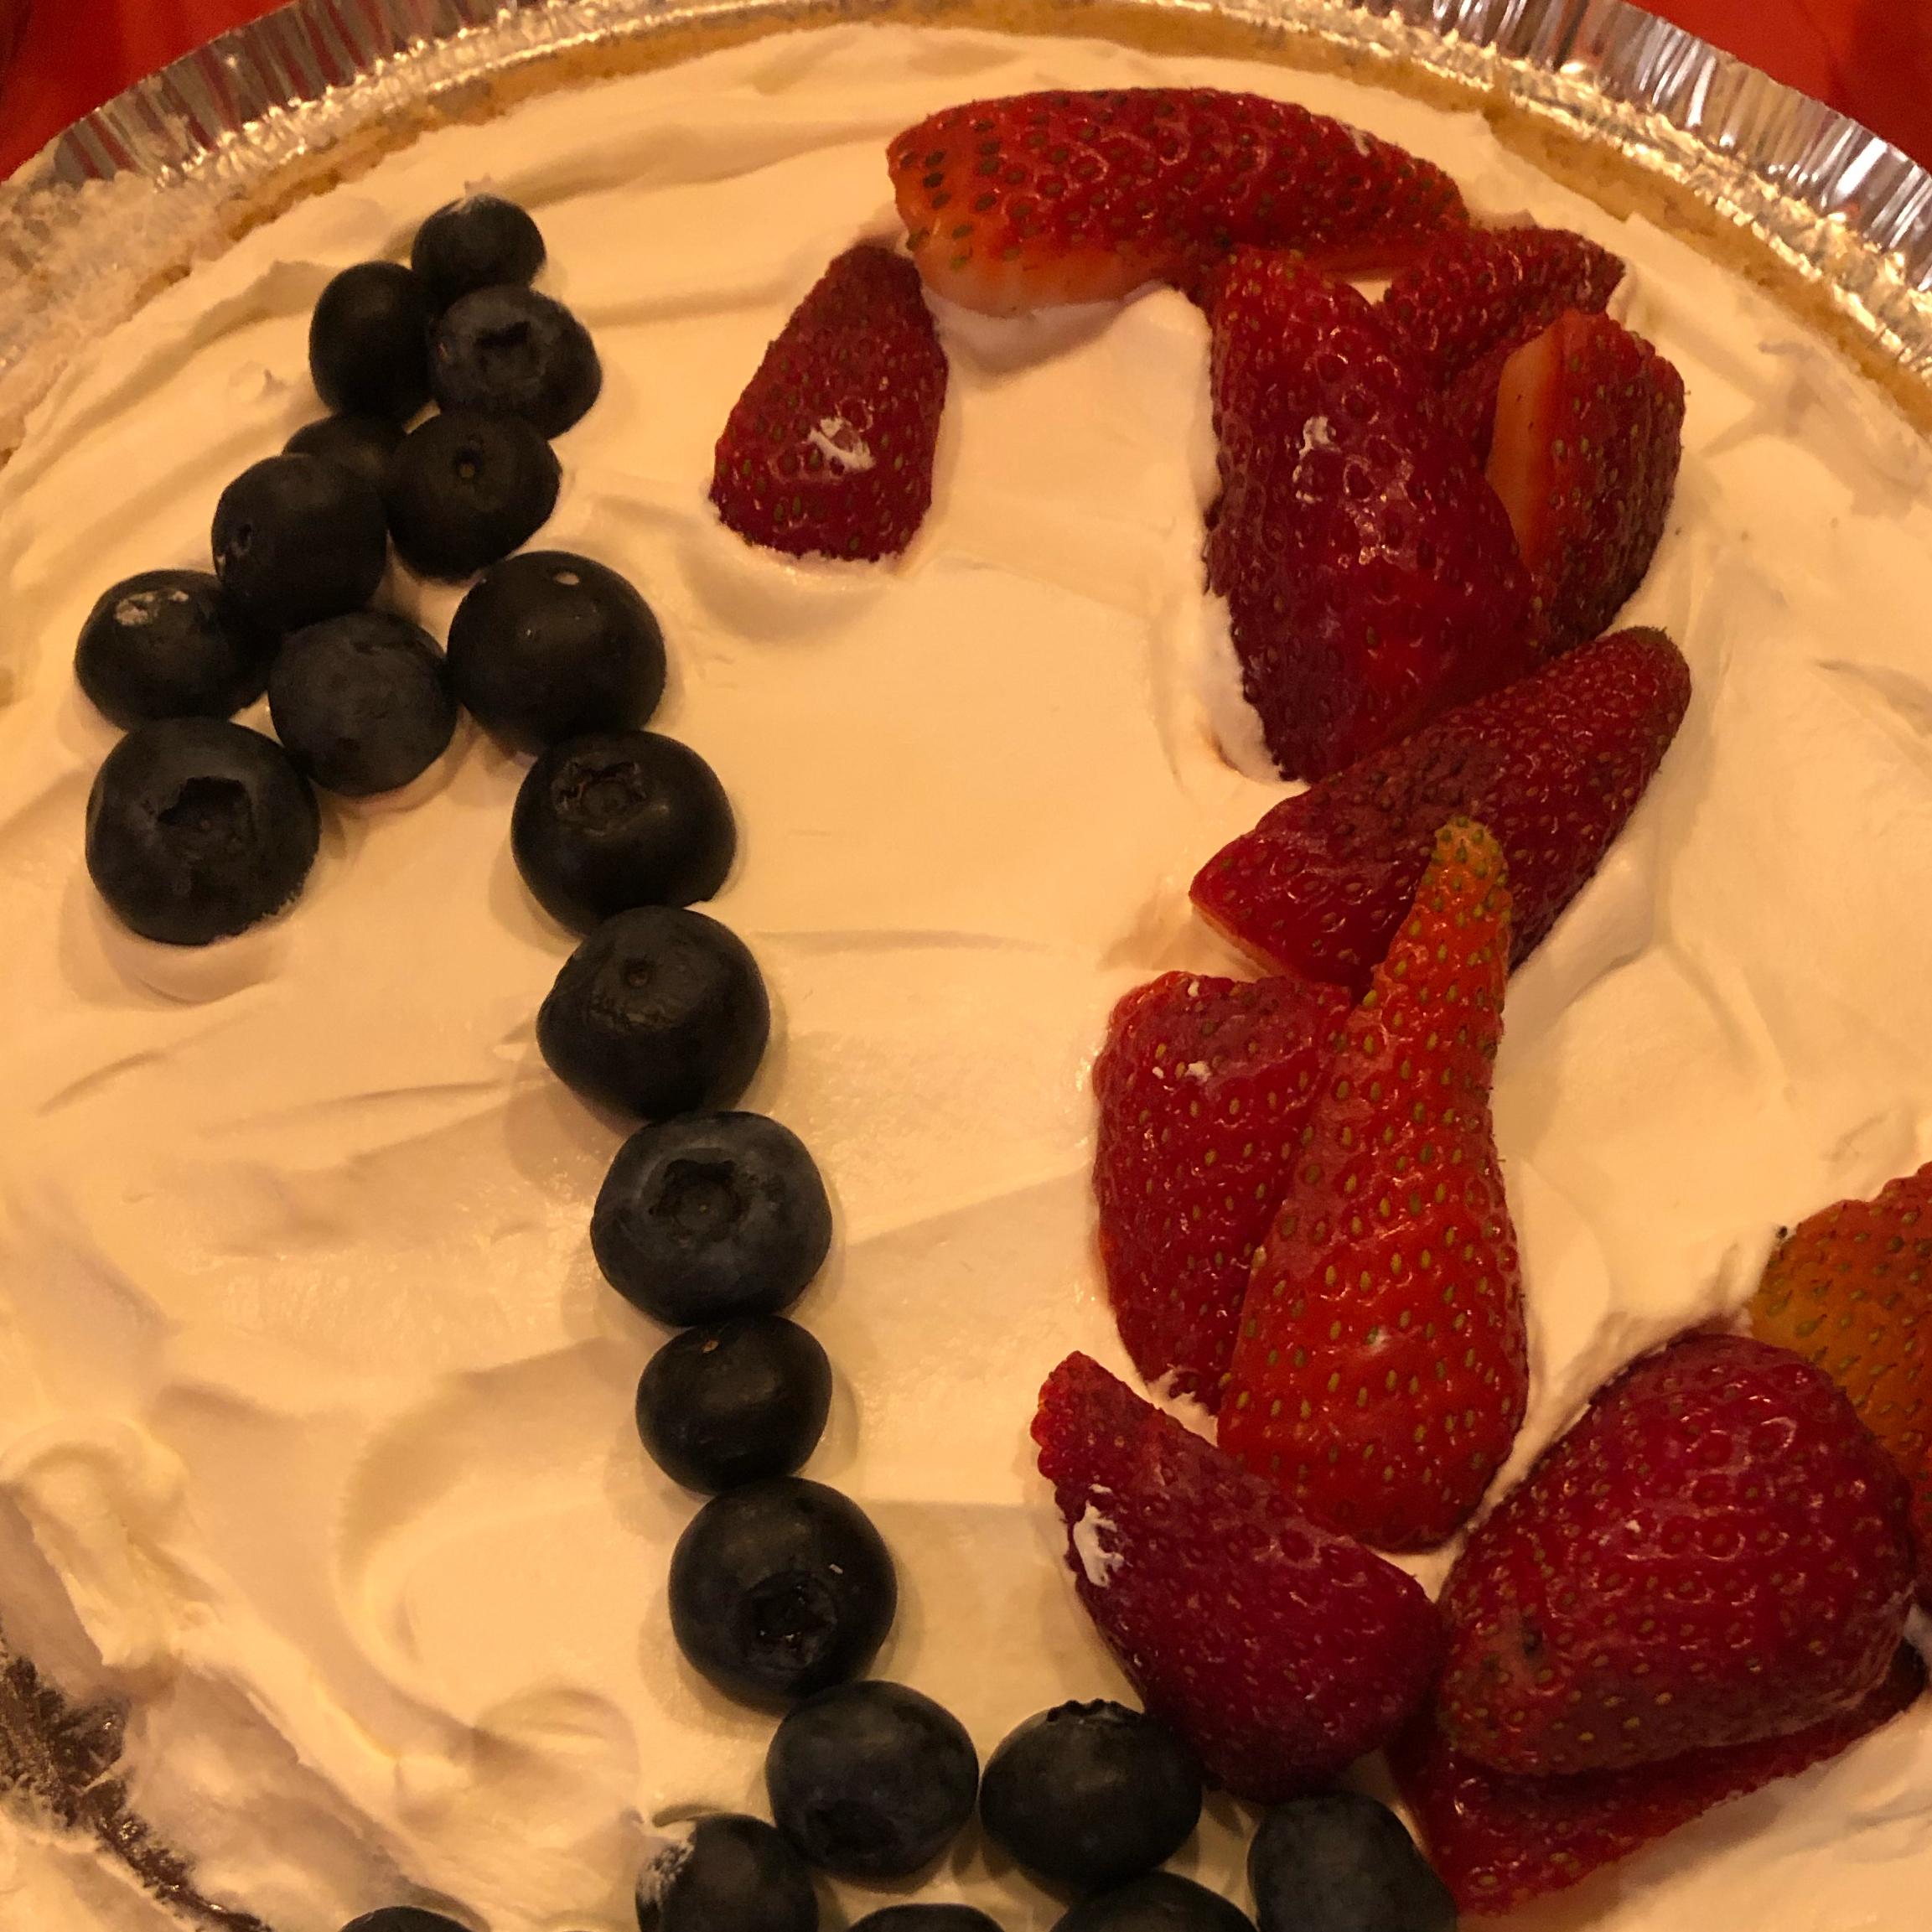 Chocolate Pie TommyFreckles